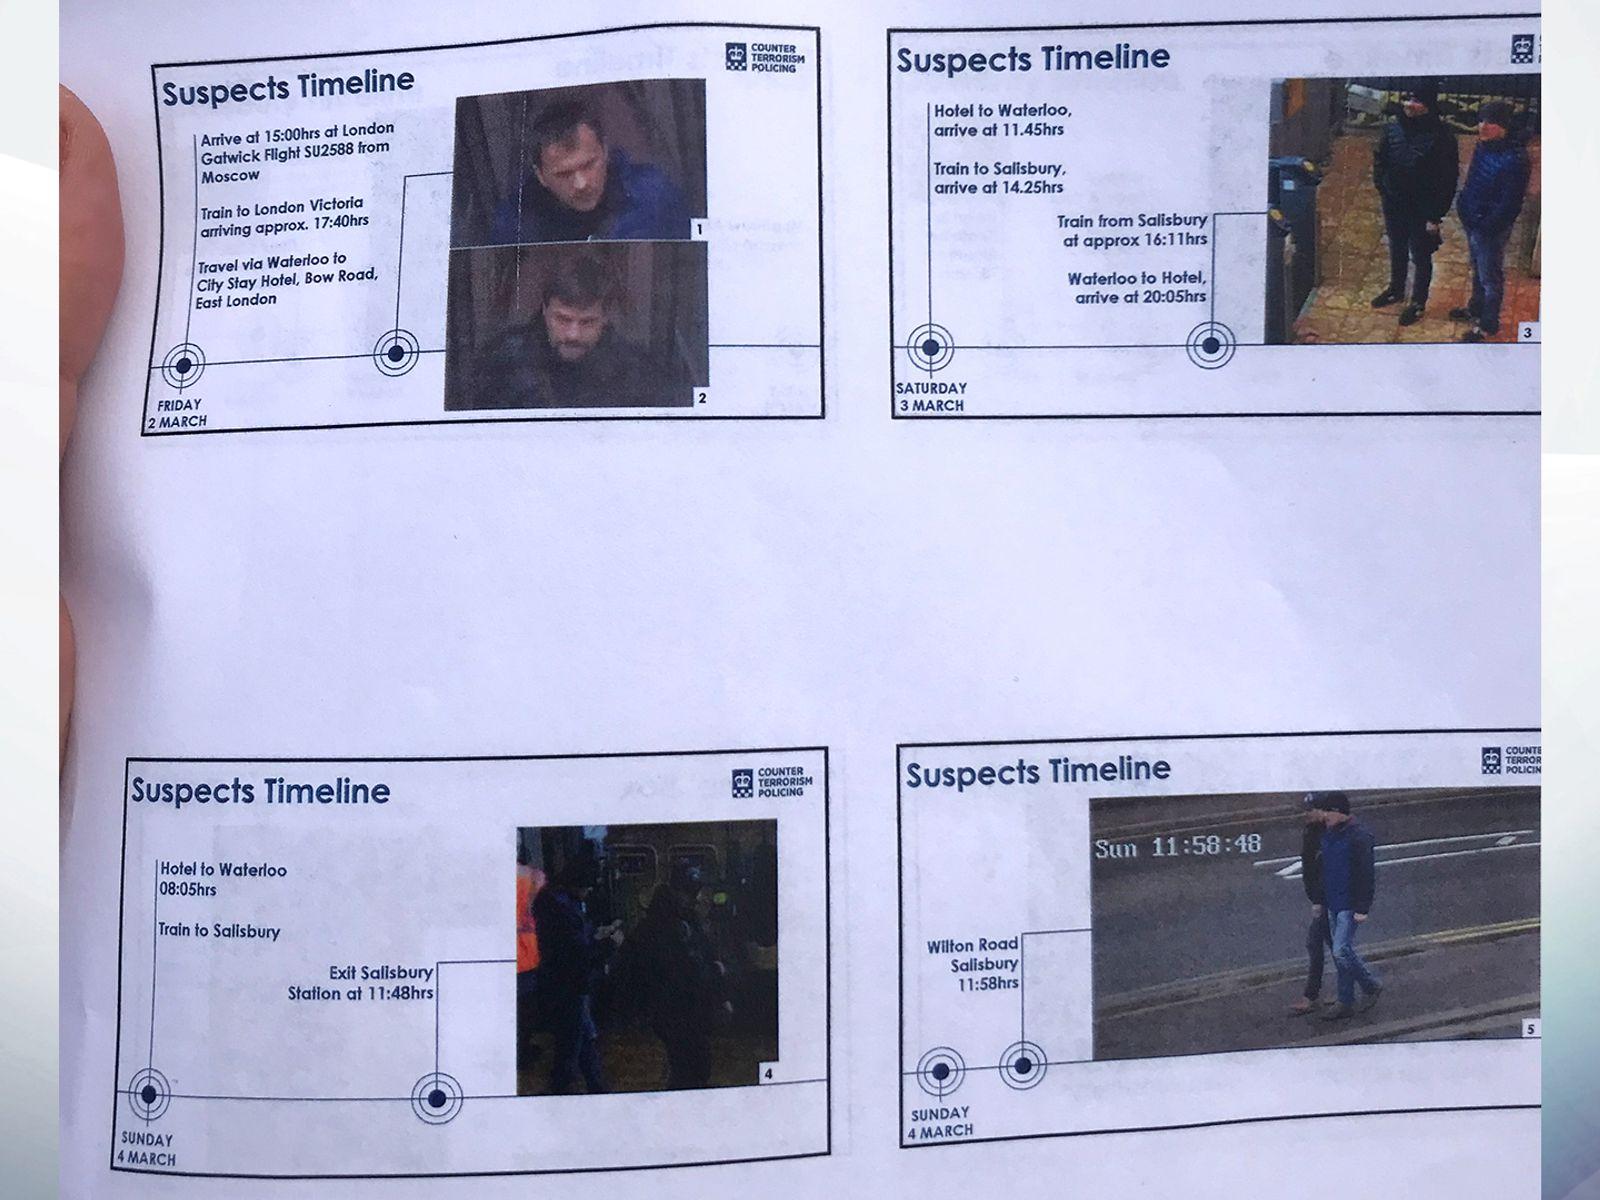 skynews-novichok-suspects-timeline-polic